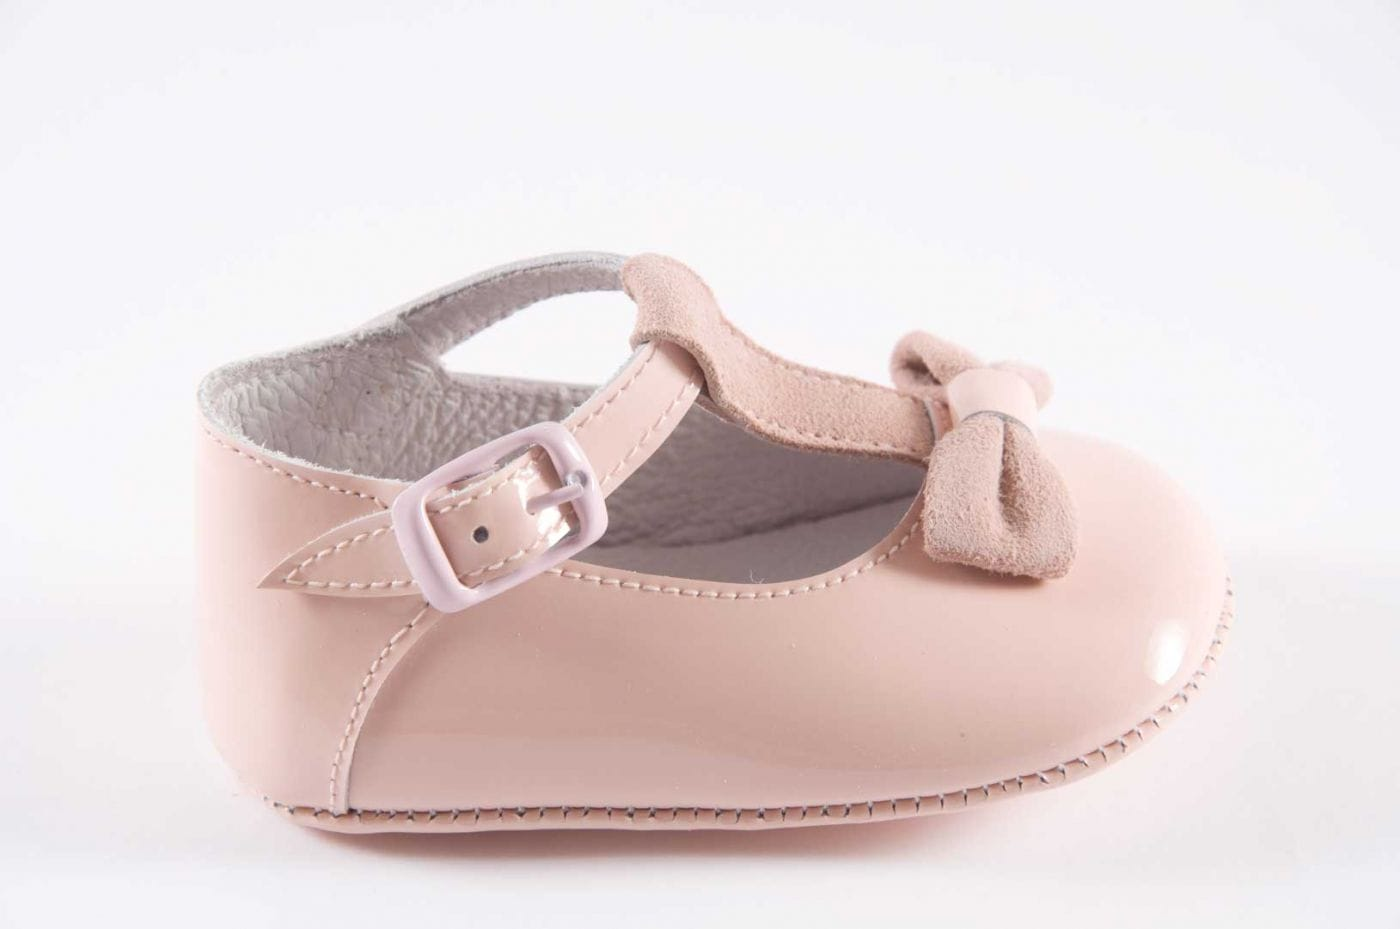 d2d7c20f Comprar zapato tipo BEBE NIÑA estilo MERCEDES COLOR ROSA CHAROL ...